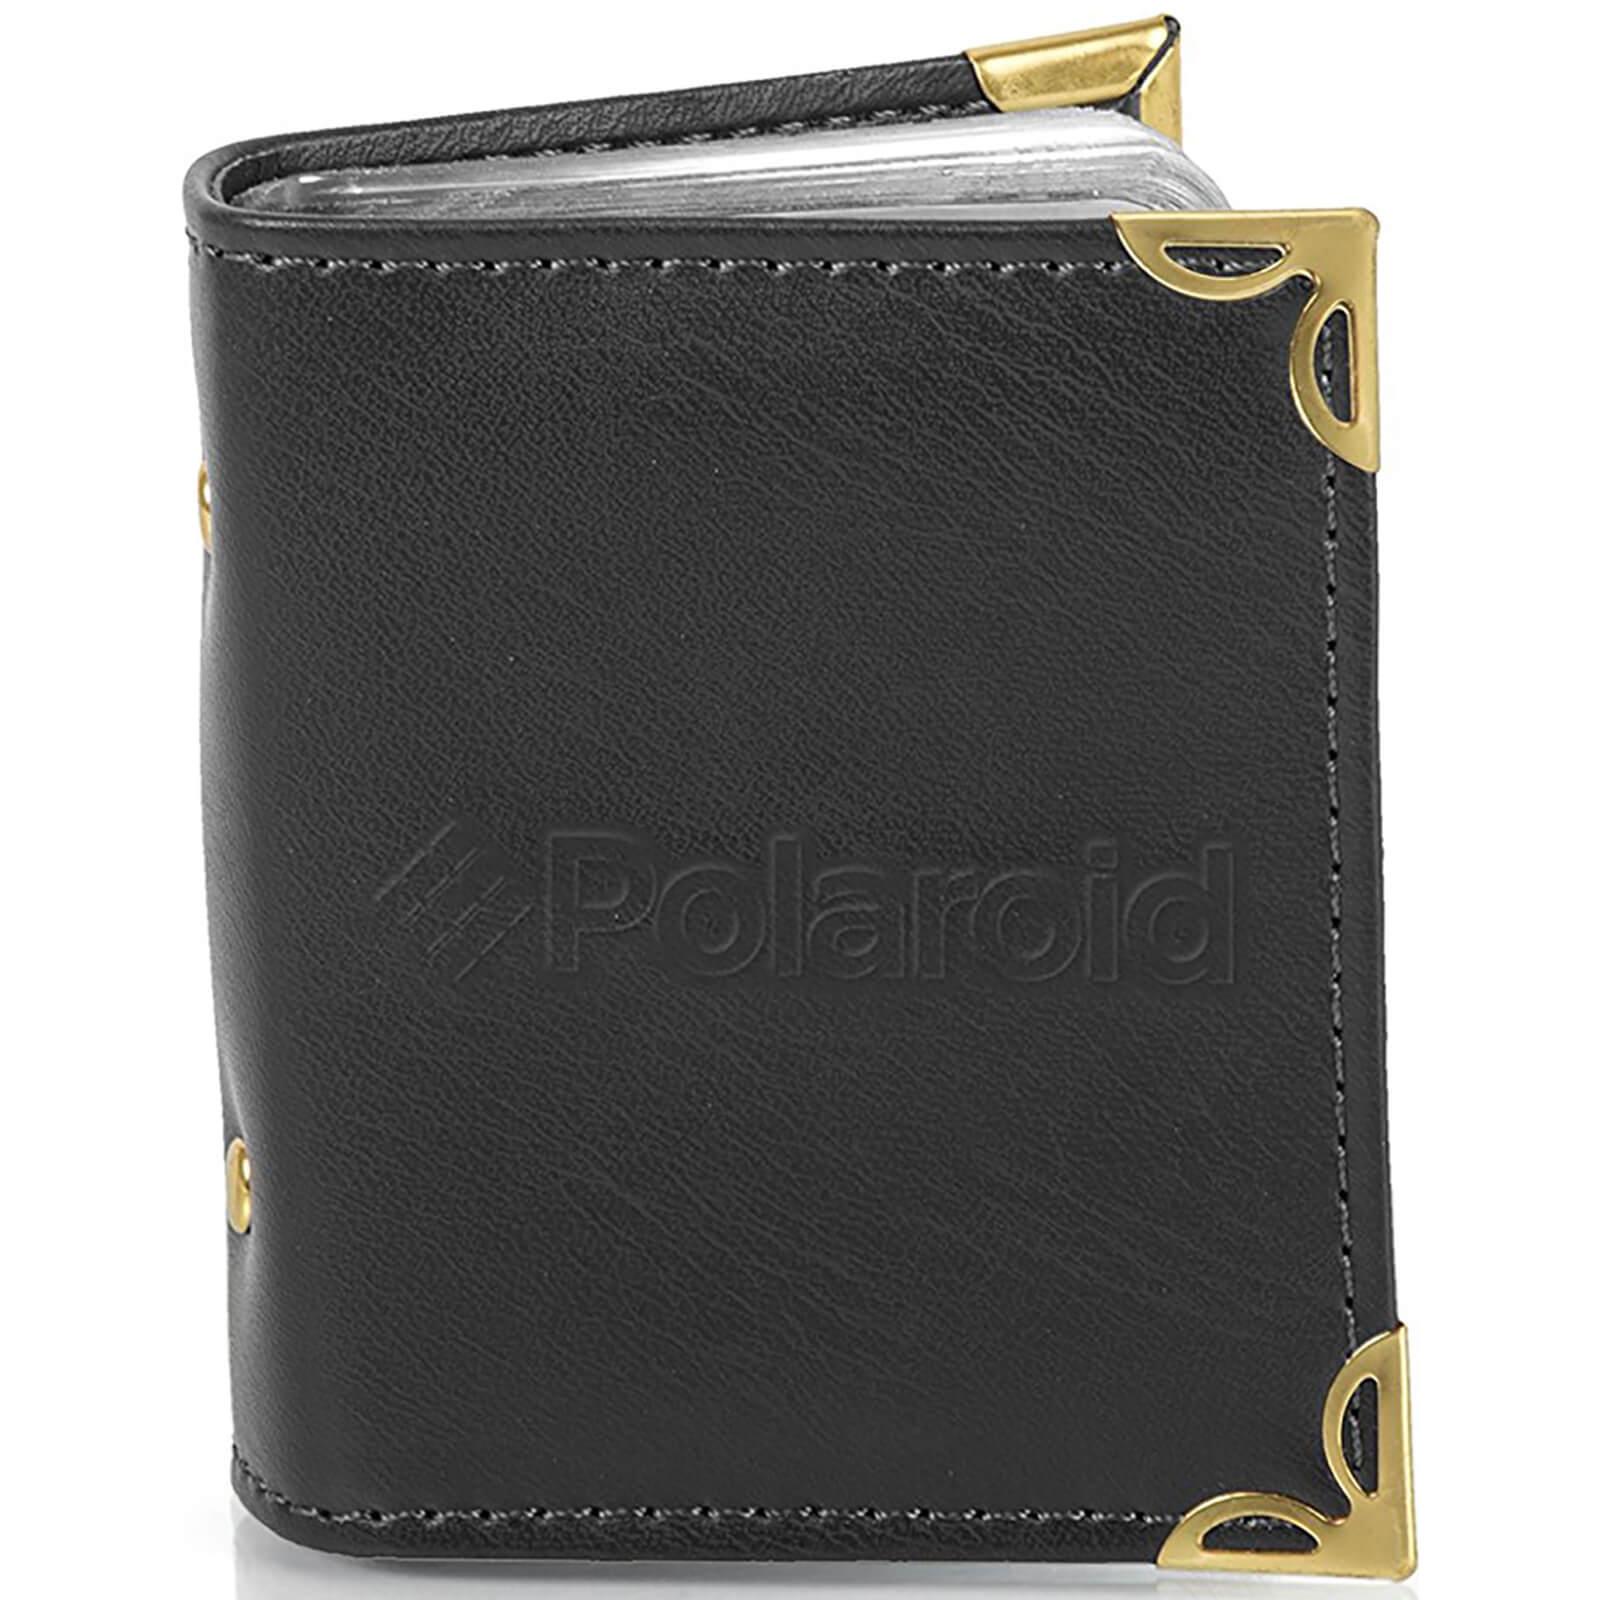 Polaroid Leatherette Photo Album (For 2x3 Inch Film/Paper) - Black